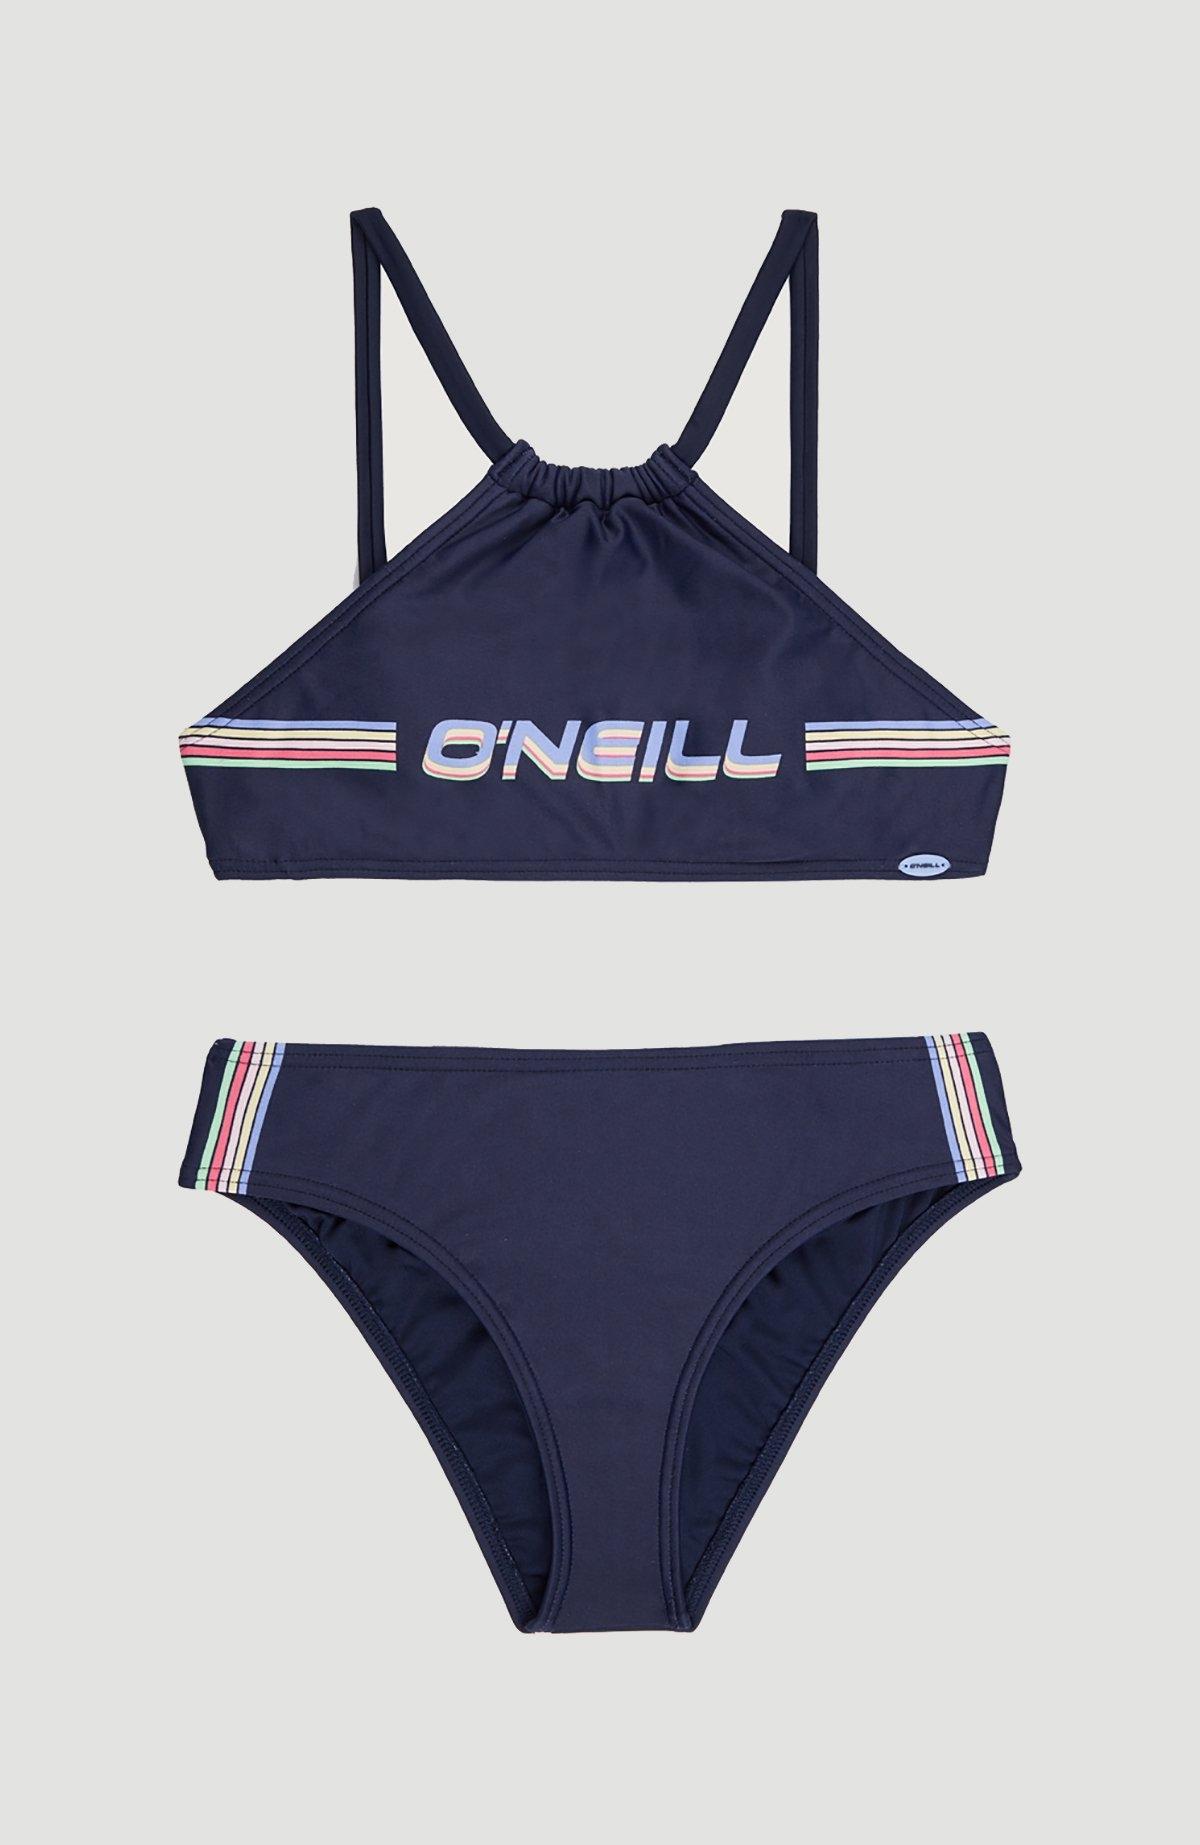 O'Neill bikini »Cali holiday« - gratis ruilen op otto.nl